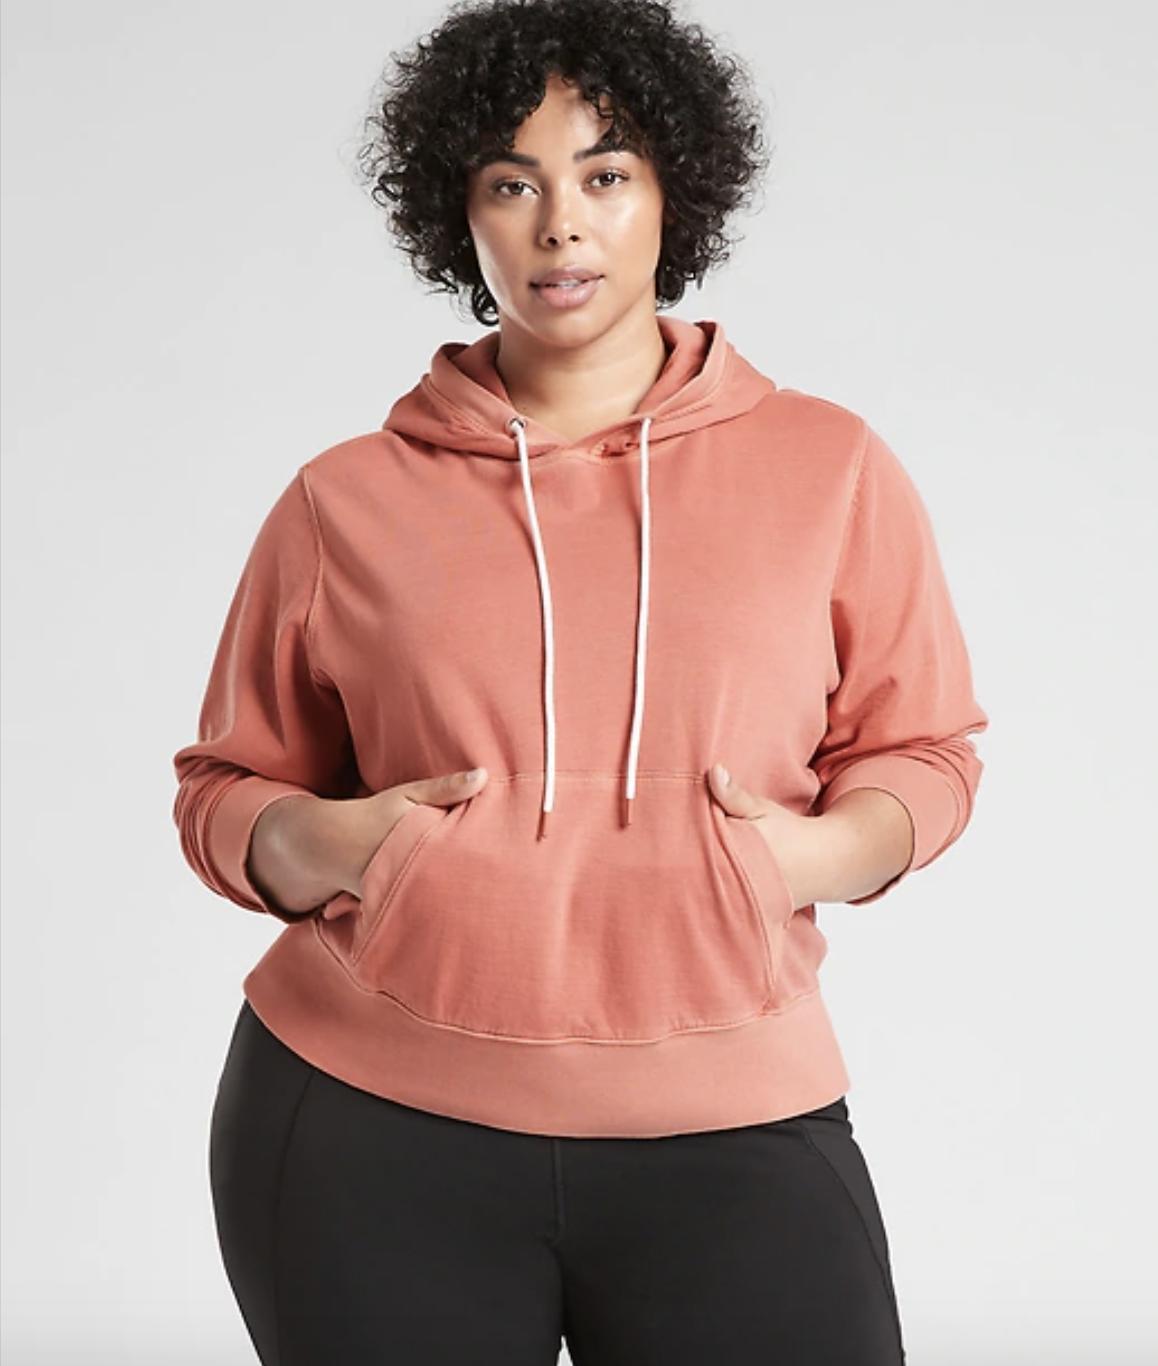 a plus size model wearing the sundown hoodie in etruscan red